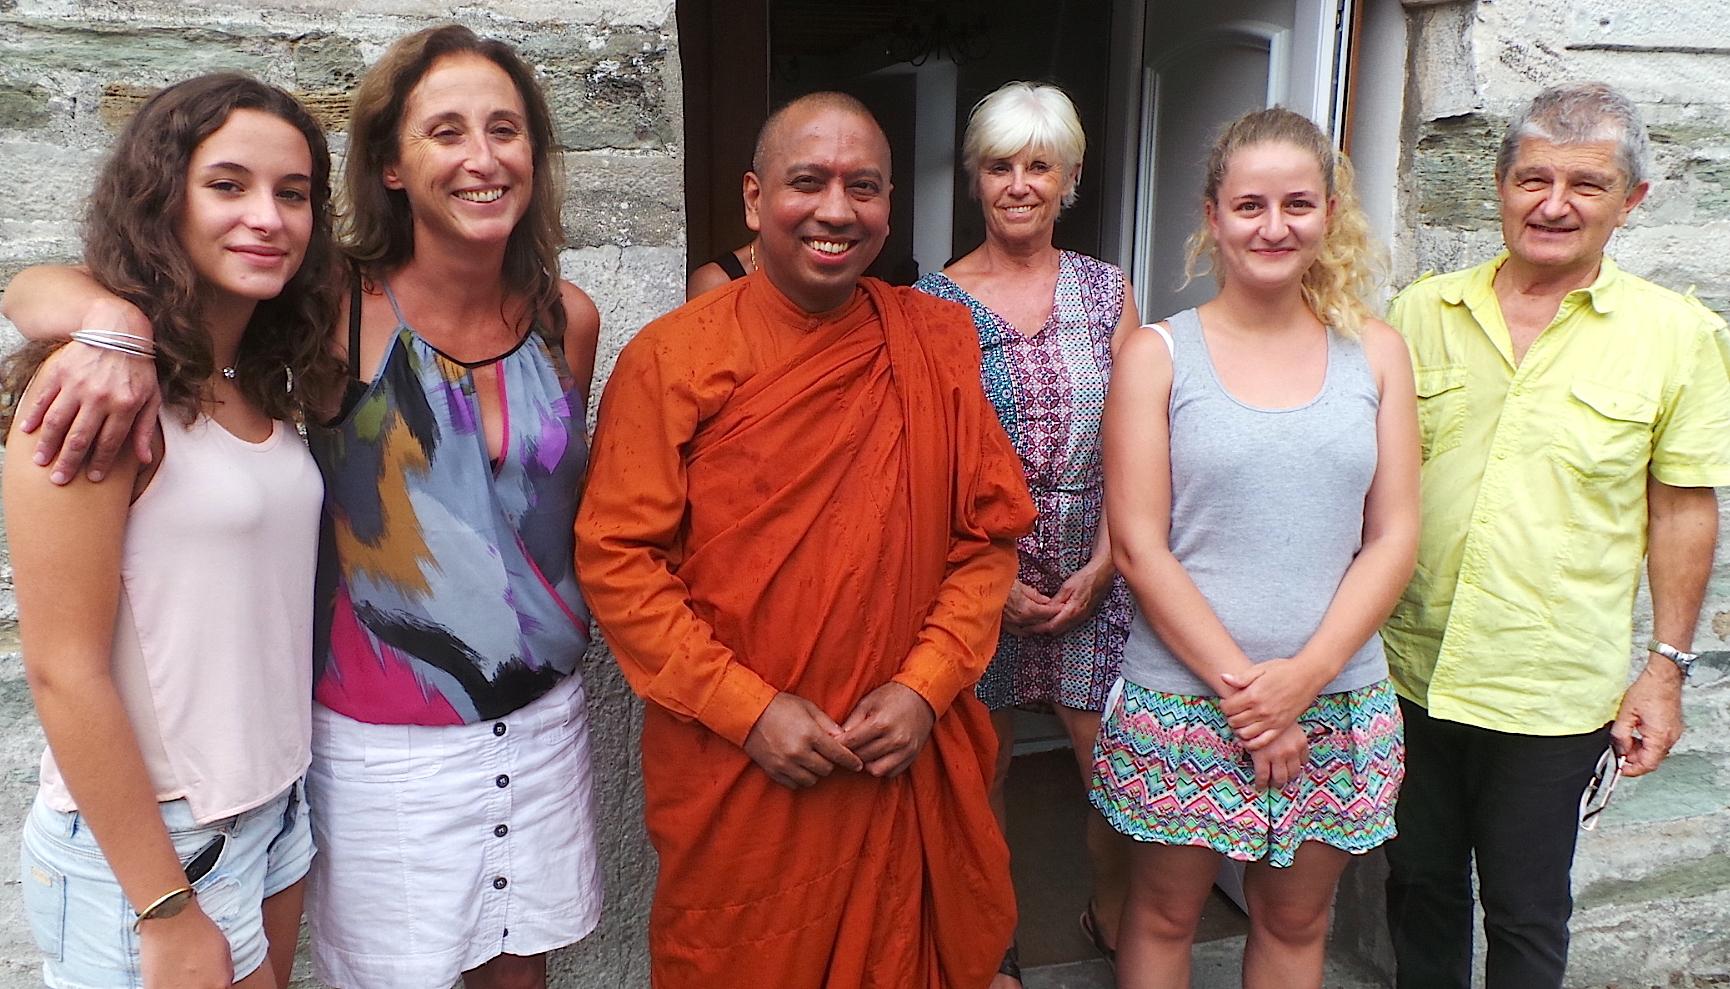 Le vénérable Bhante Saranapala enseigne la méditation à Santa Maria di Lota